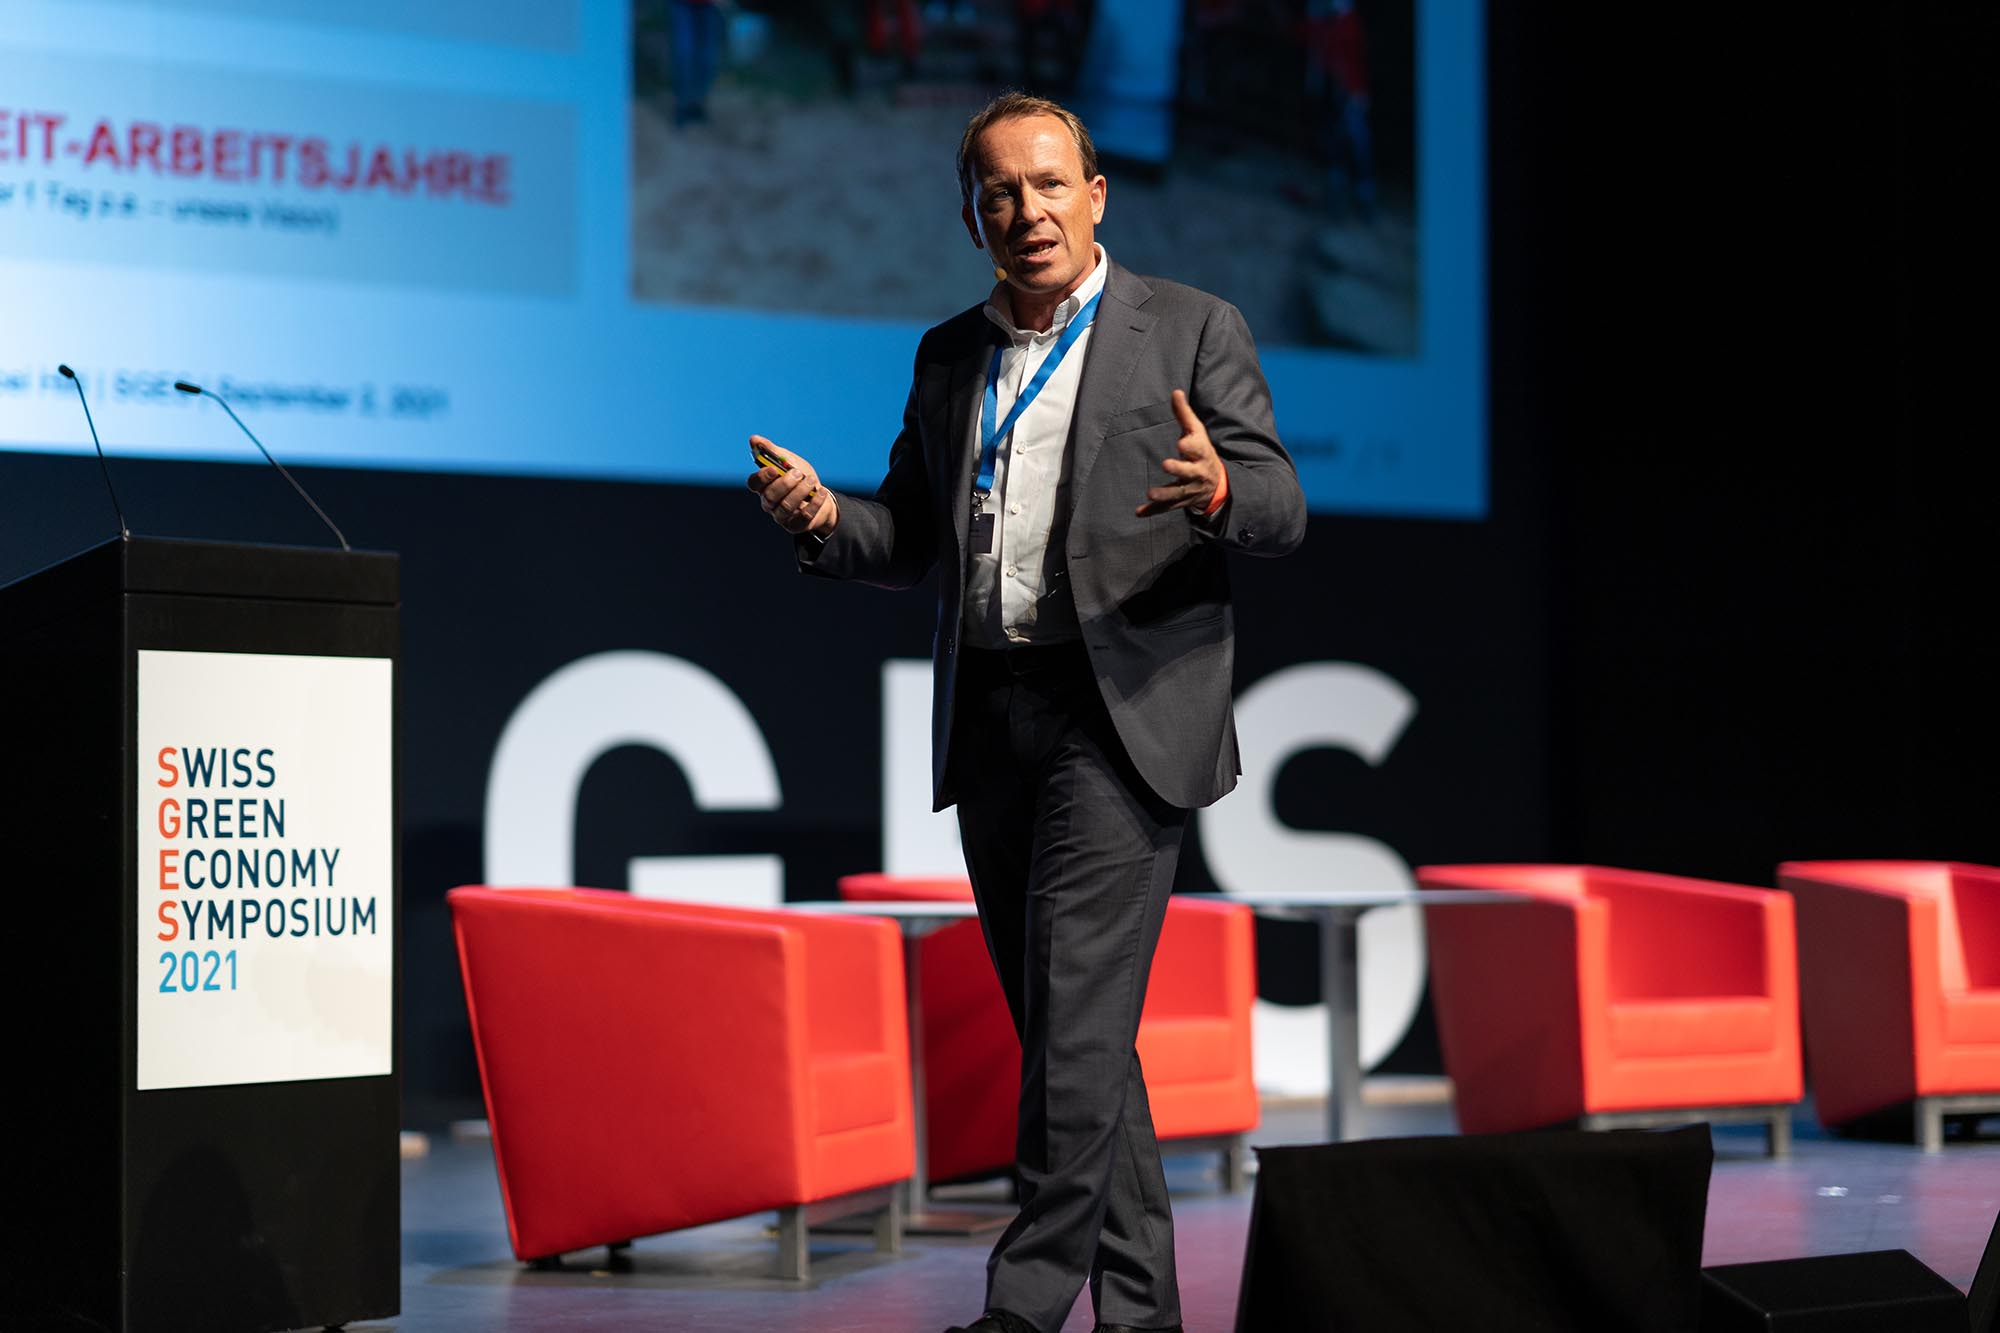 SGES Keynote: Dr. Christoph Loos, Vorsitzender der Konzernleitung, Hilti